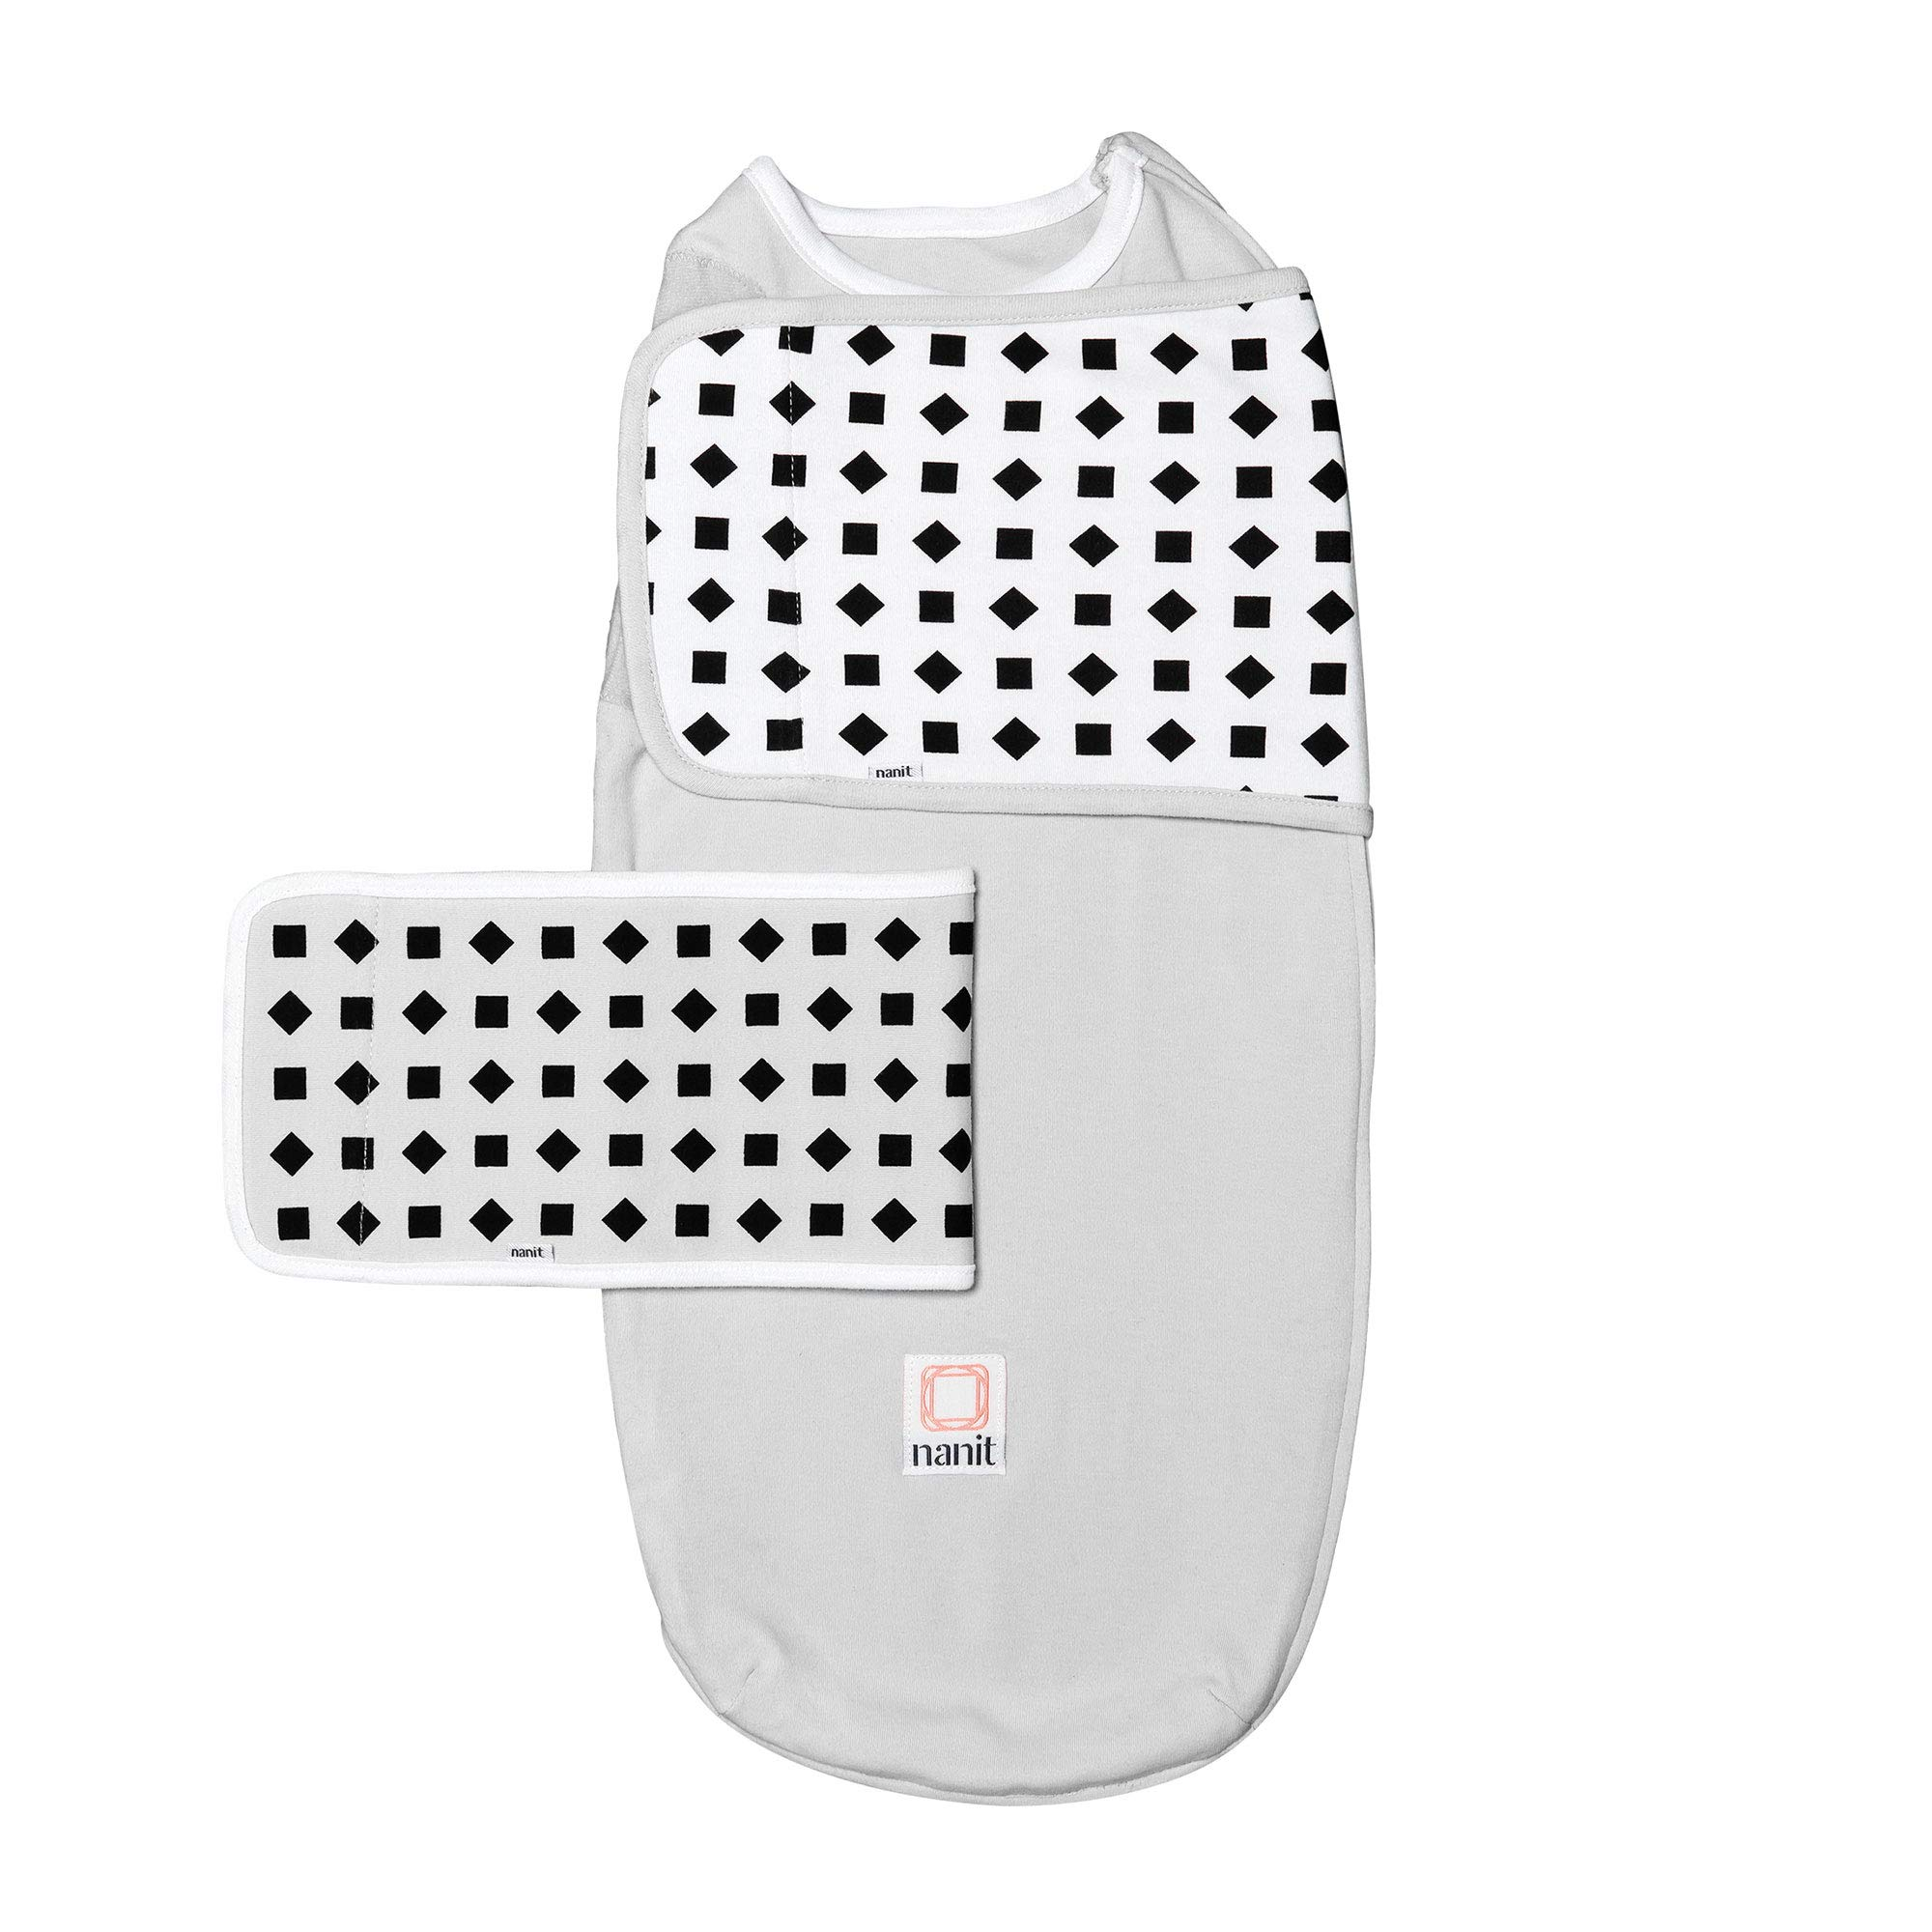 Nanit Breathing Wear Starter Pack - Size Small, Pebble